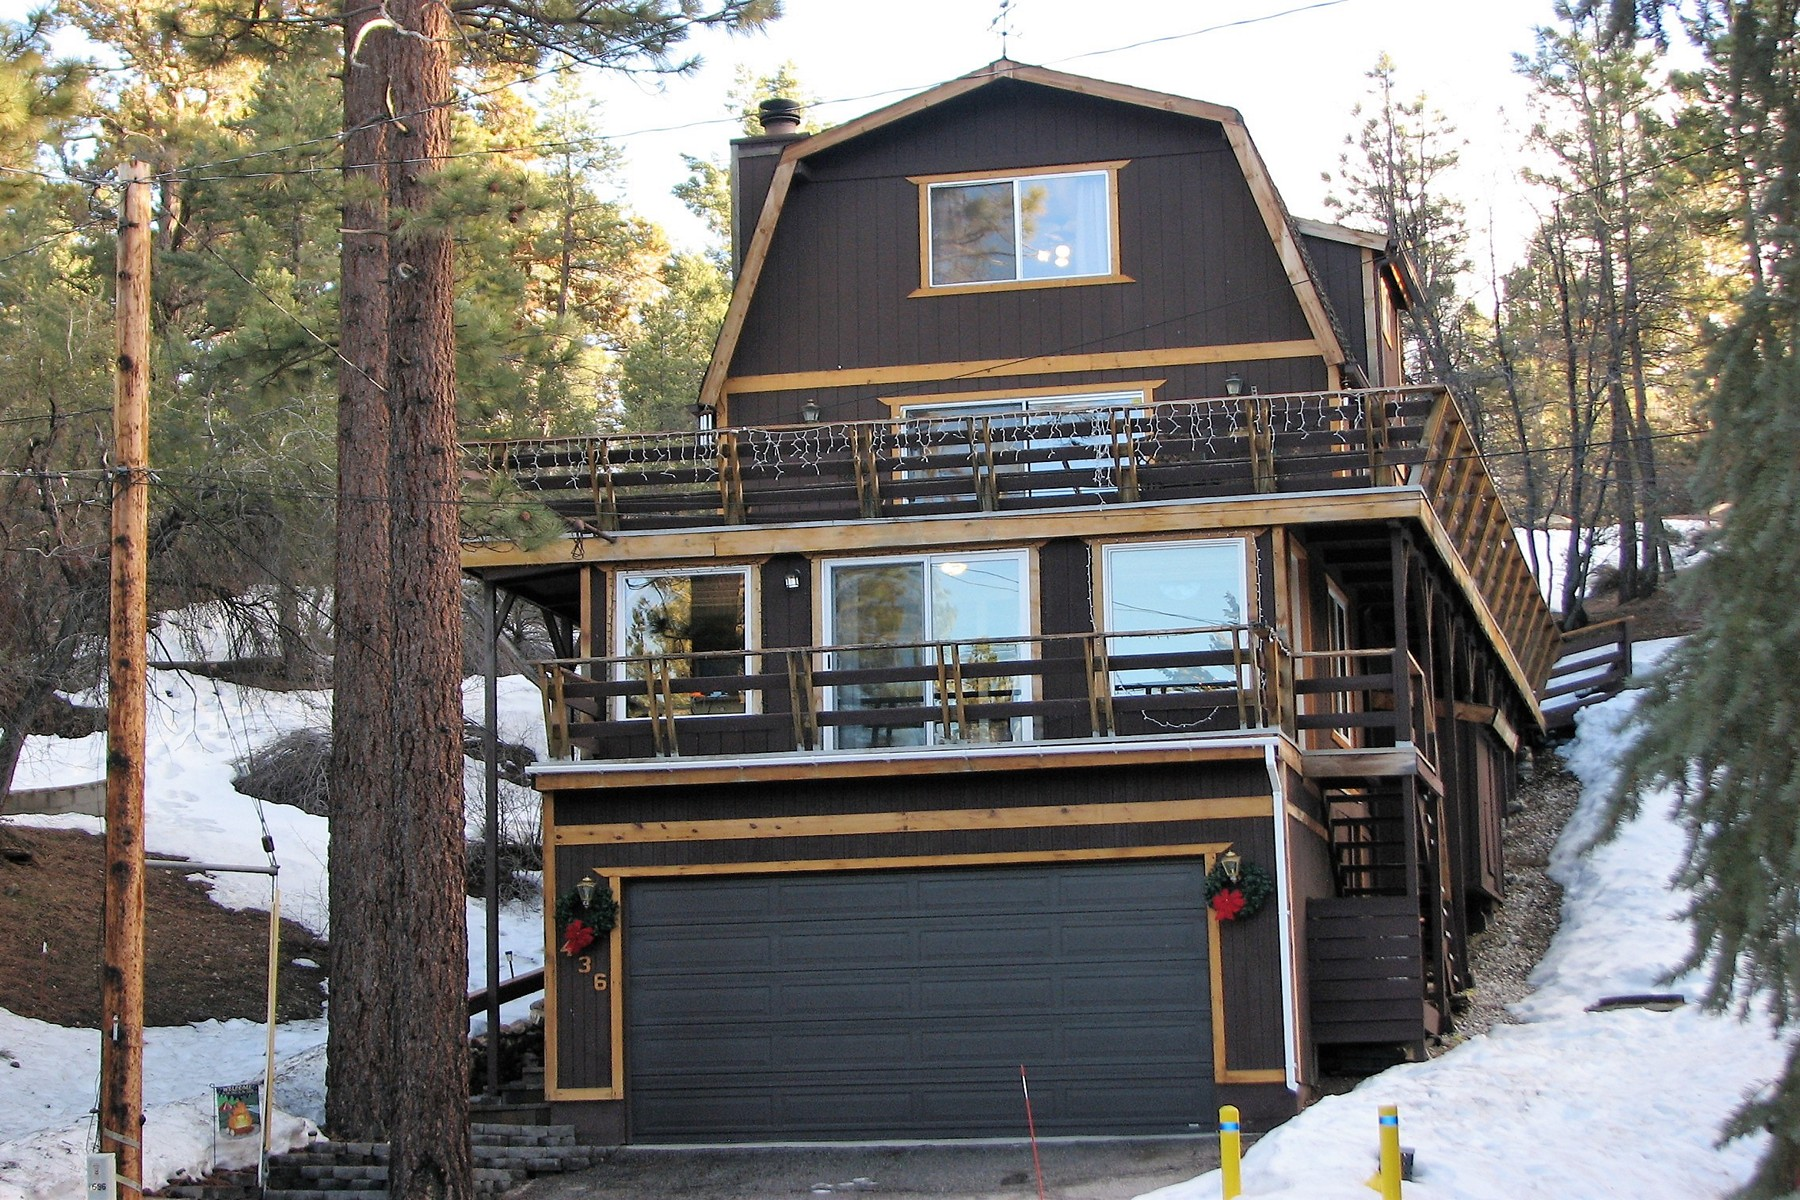 Single Family Home for Sale at Big Bear 436 Sheridan Drive Big Bear City, California 92314 United States